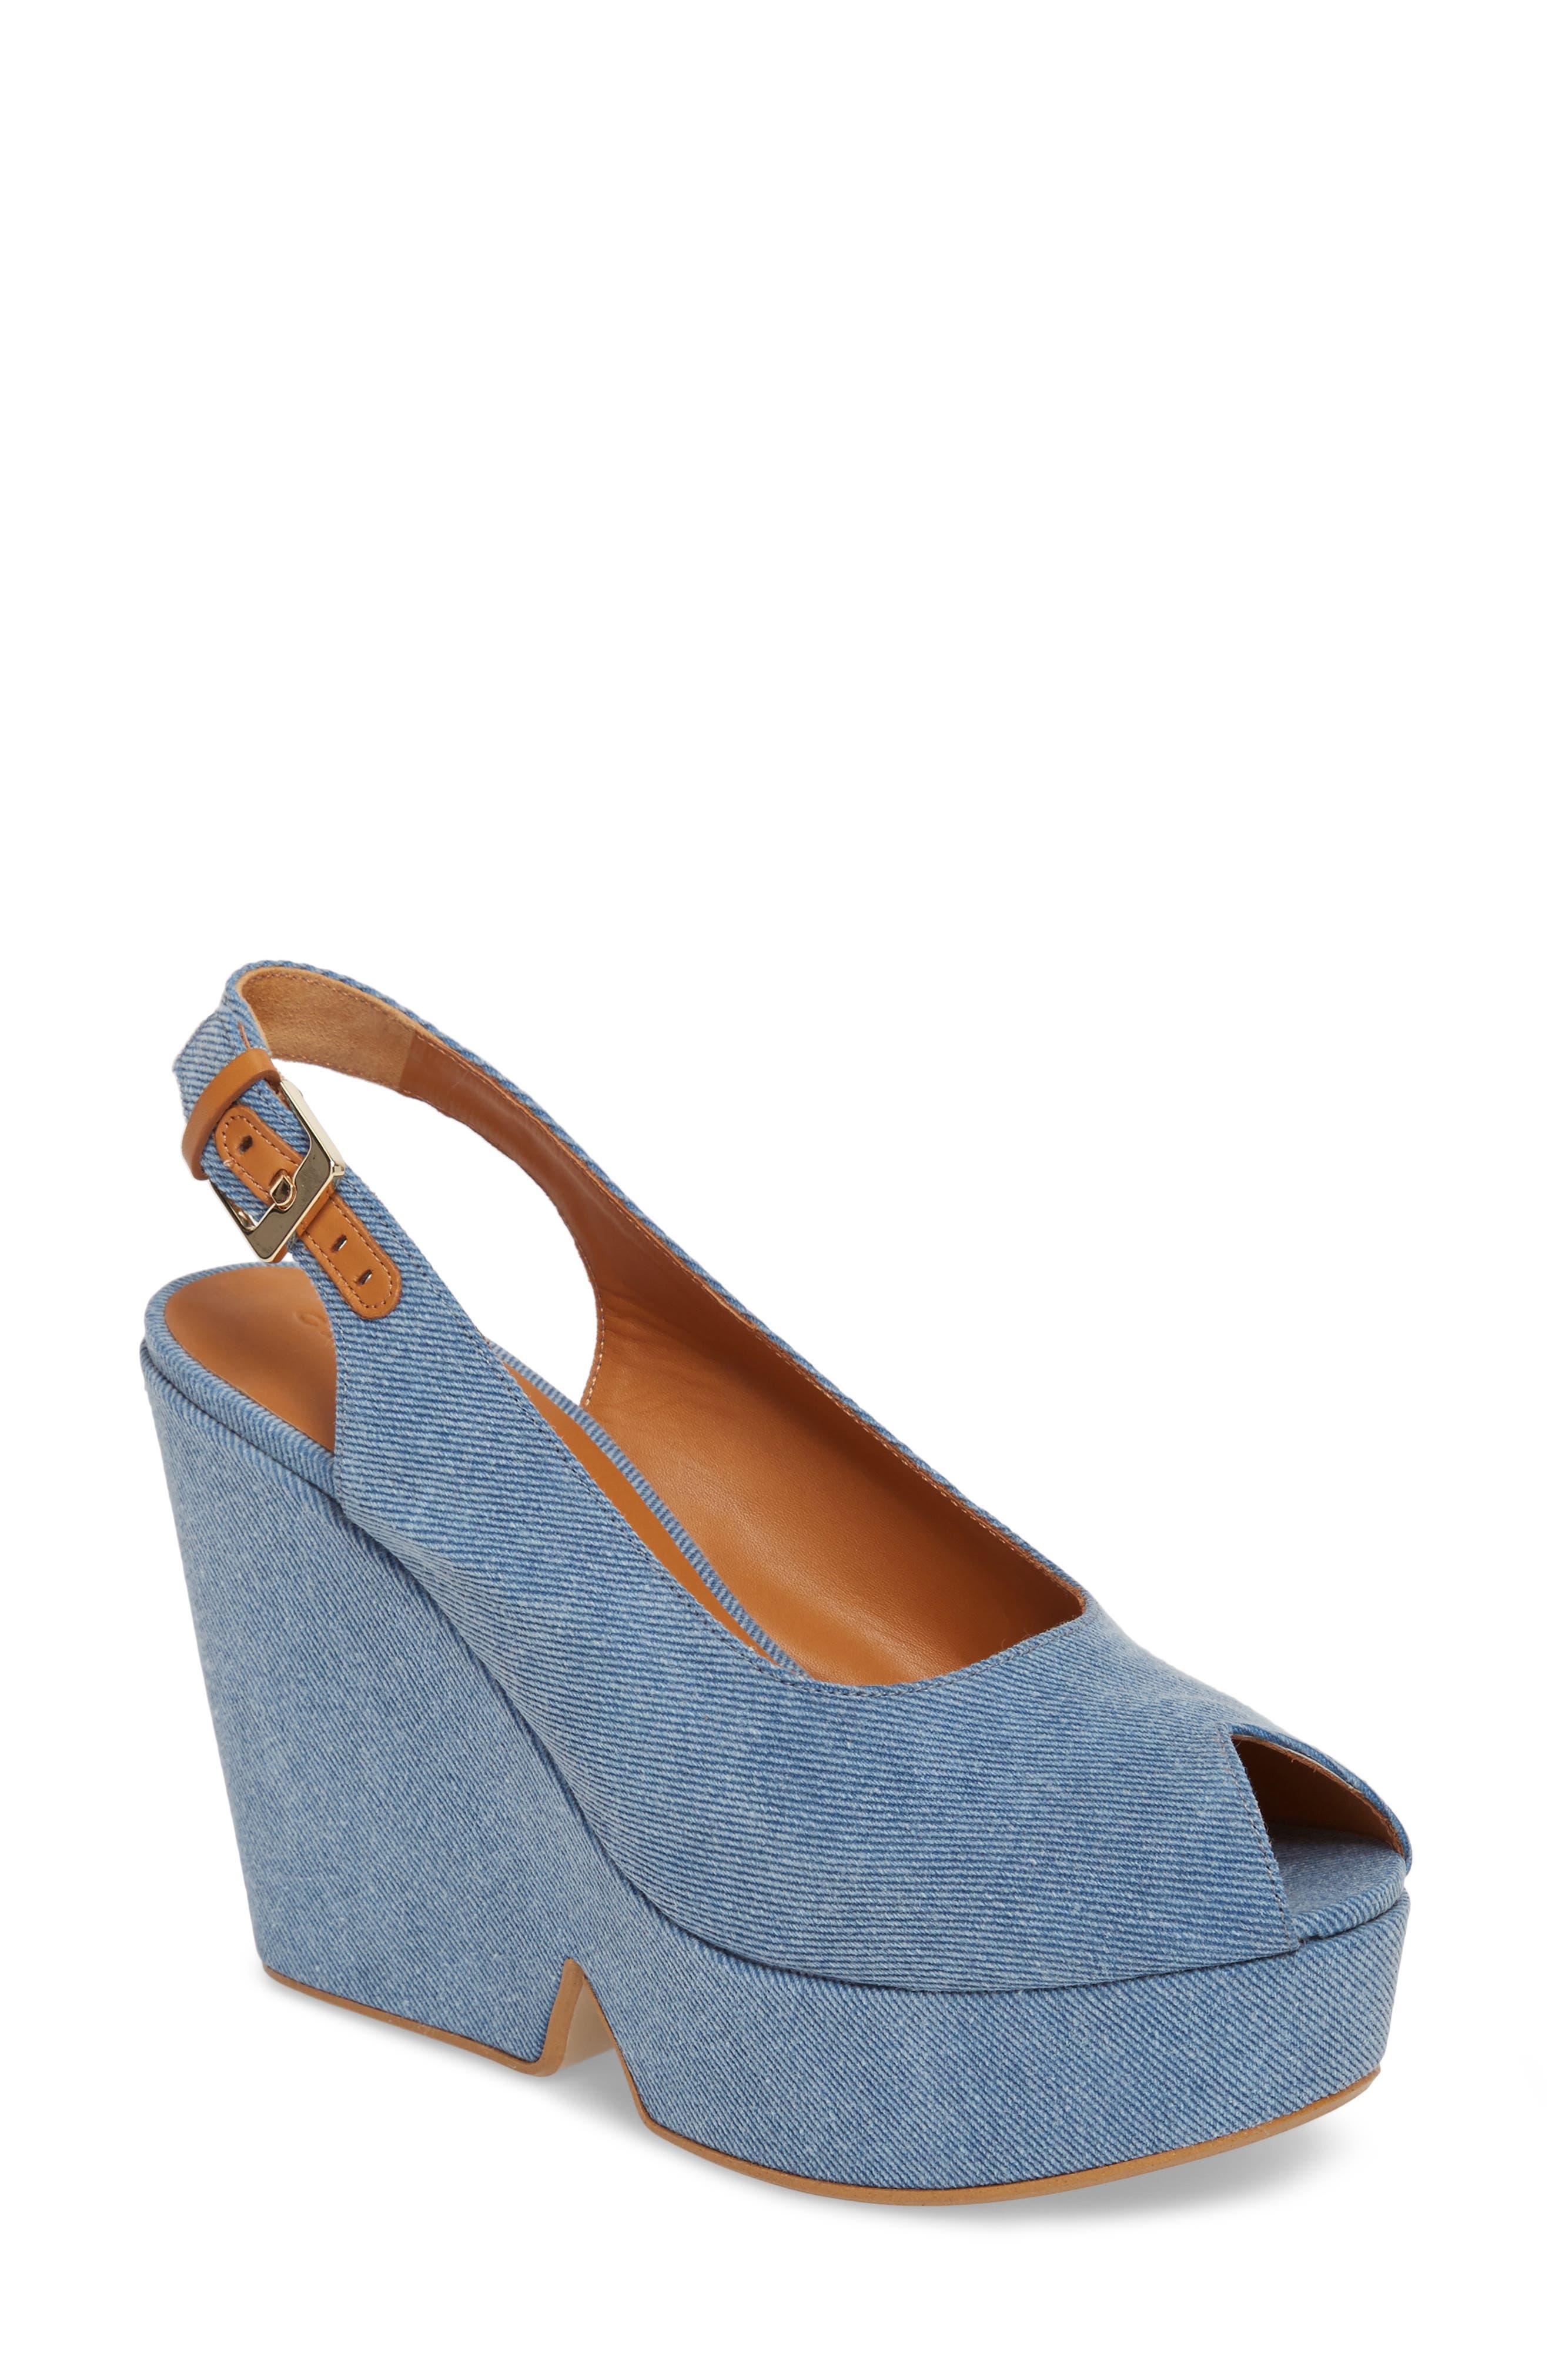 Dylanto Platform Wedge Sandal,                             Main thumbnail 1, color,